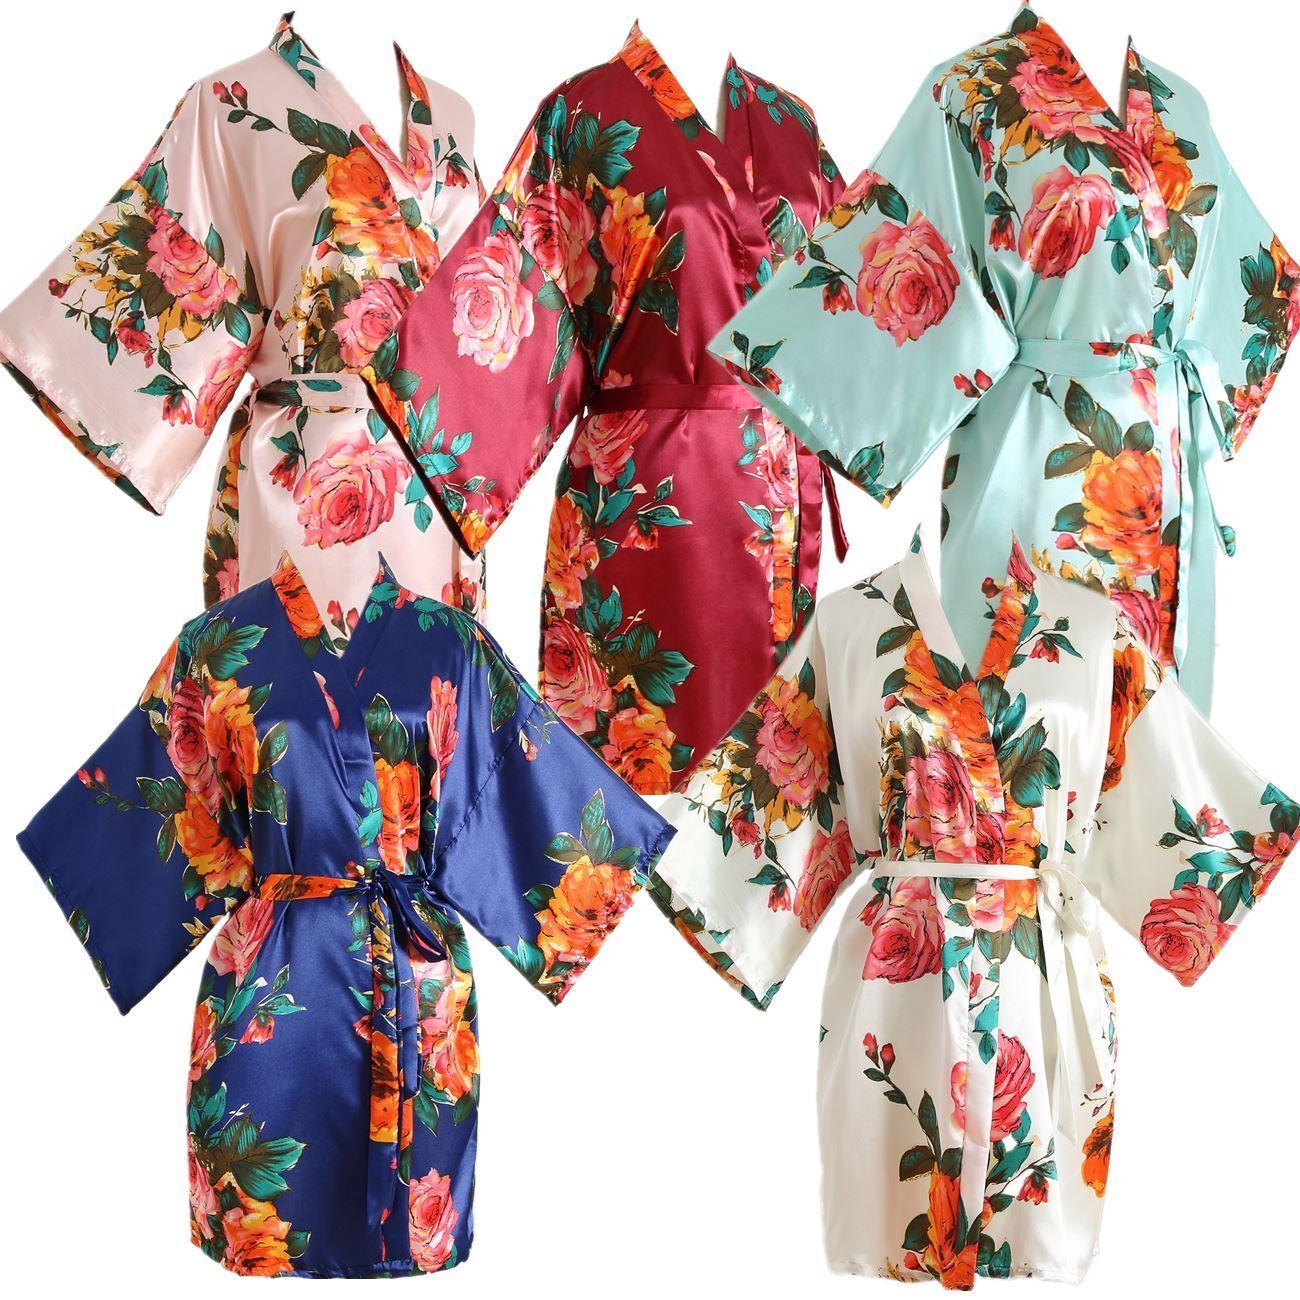 Silk Satin Floral Bridesmaid Robes Gowns Bride Bath Robe Wedding Kimono Robes Uk Ebay